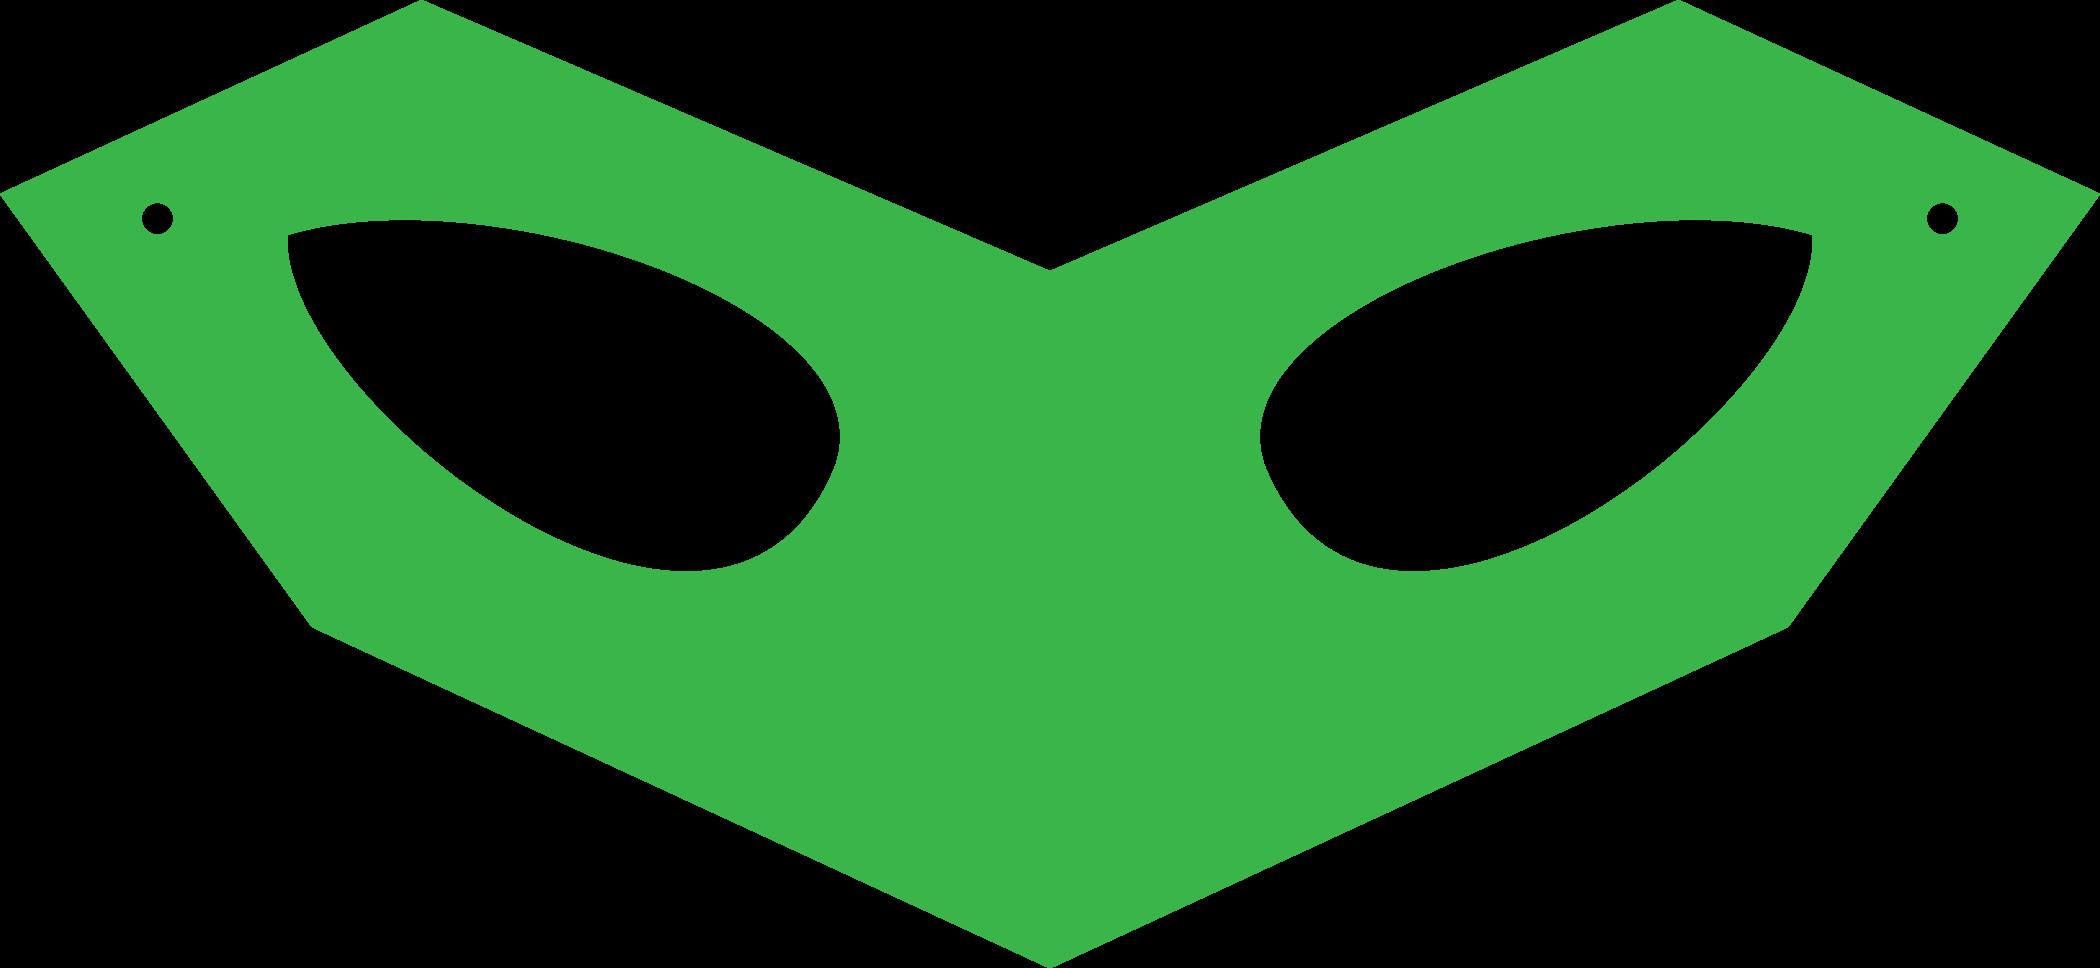 Green Lantern Mask Template Robin Mask Template